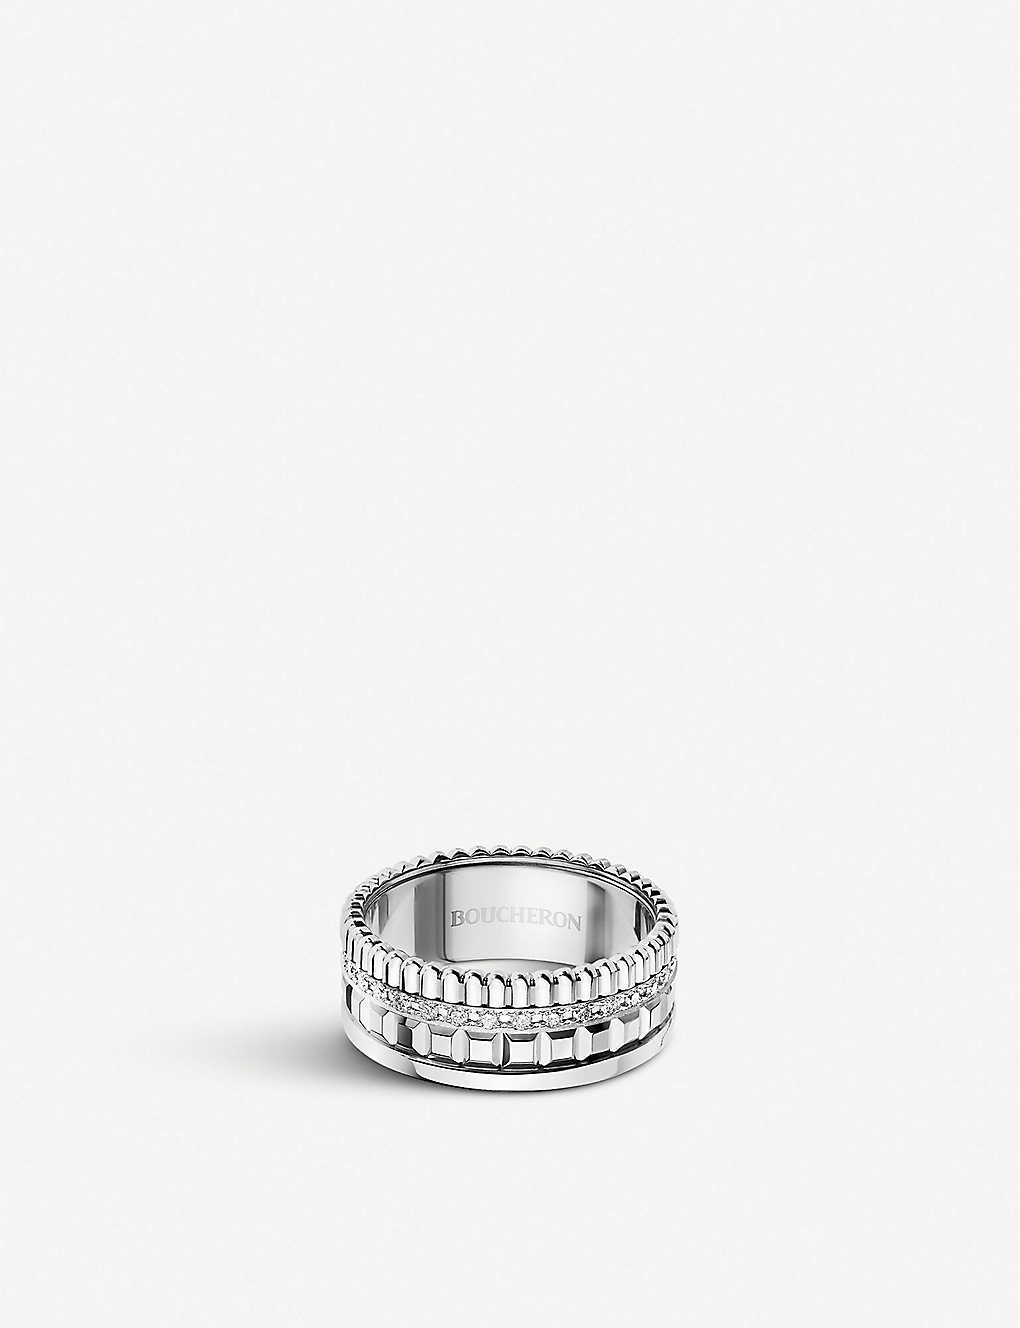 7dd02da71d403 Quatre Radiant Edition white-gold and diamond ring